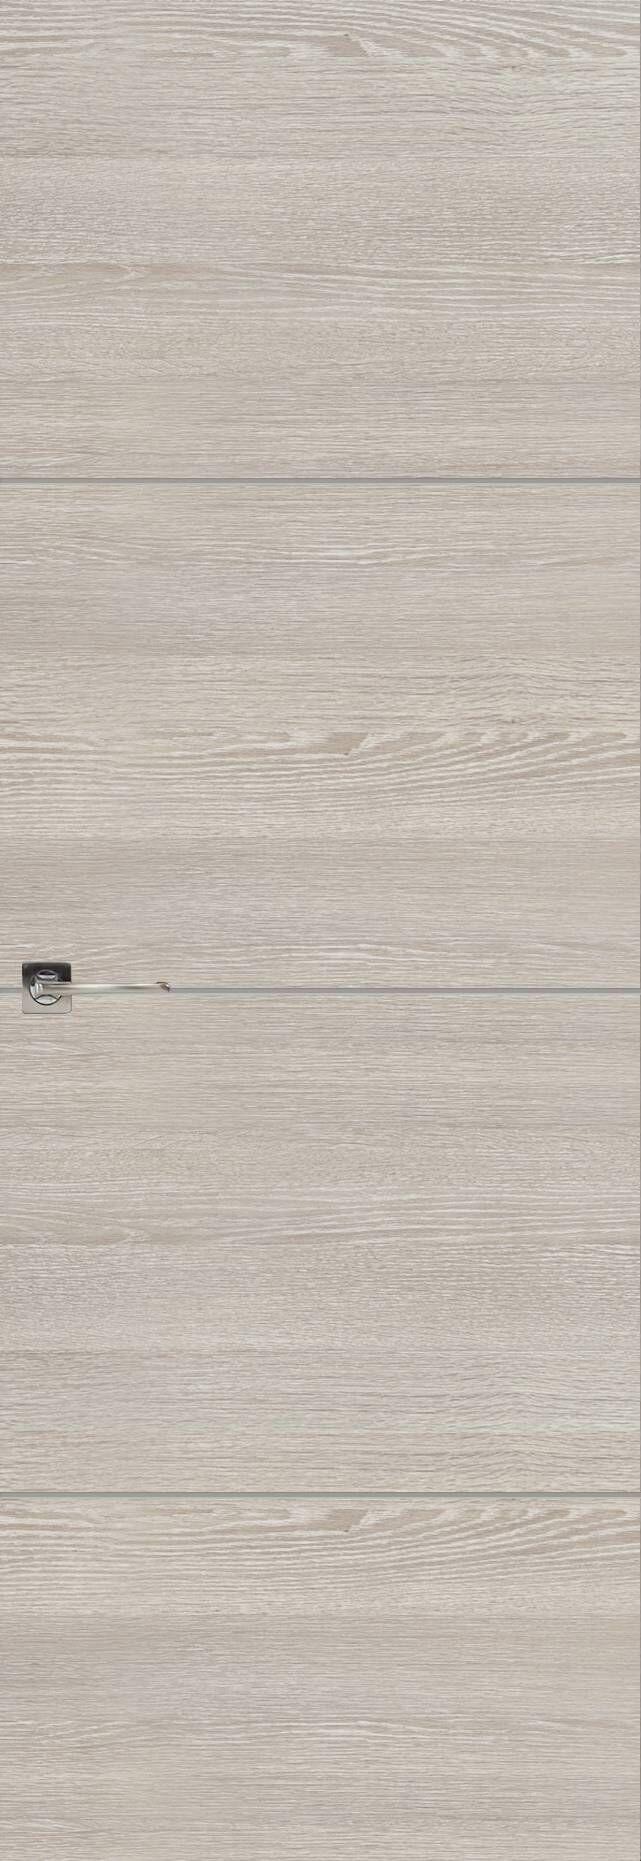 Tivoli Г-2 Invisible цвет - Серый дуб Без стекла (ДГ)